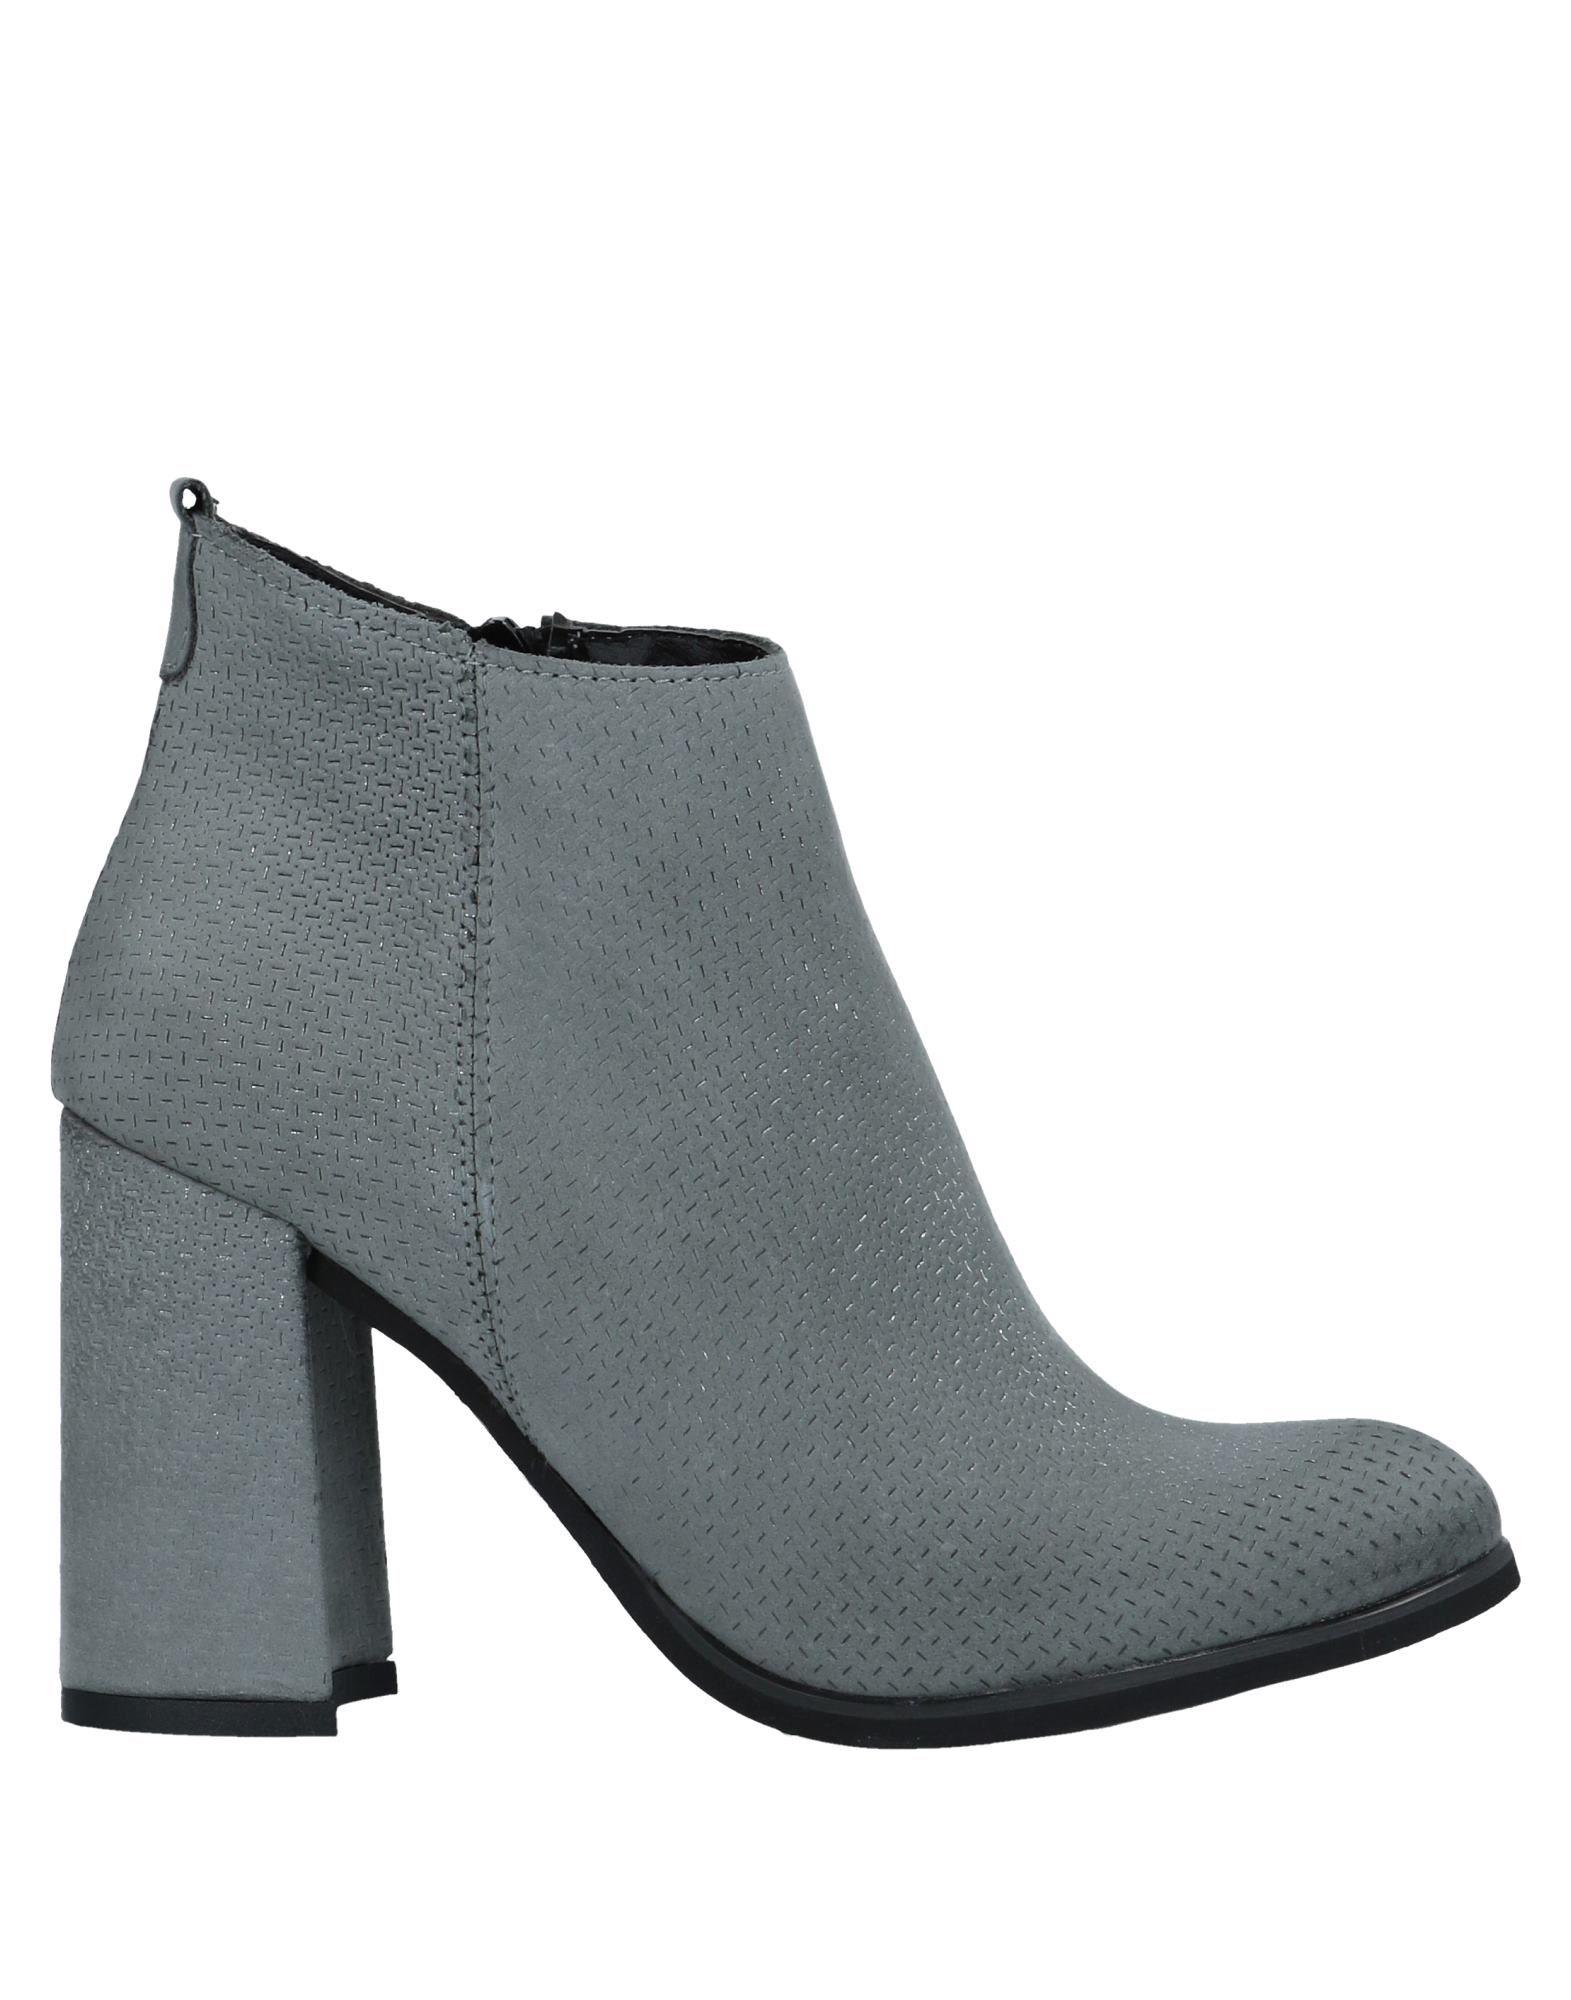 Moda Stivaletti Stivaletti Moda Unlace Donna - 11522642BK b35a60